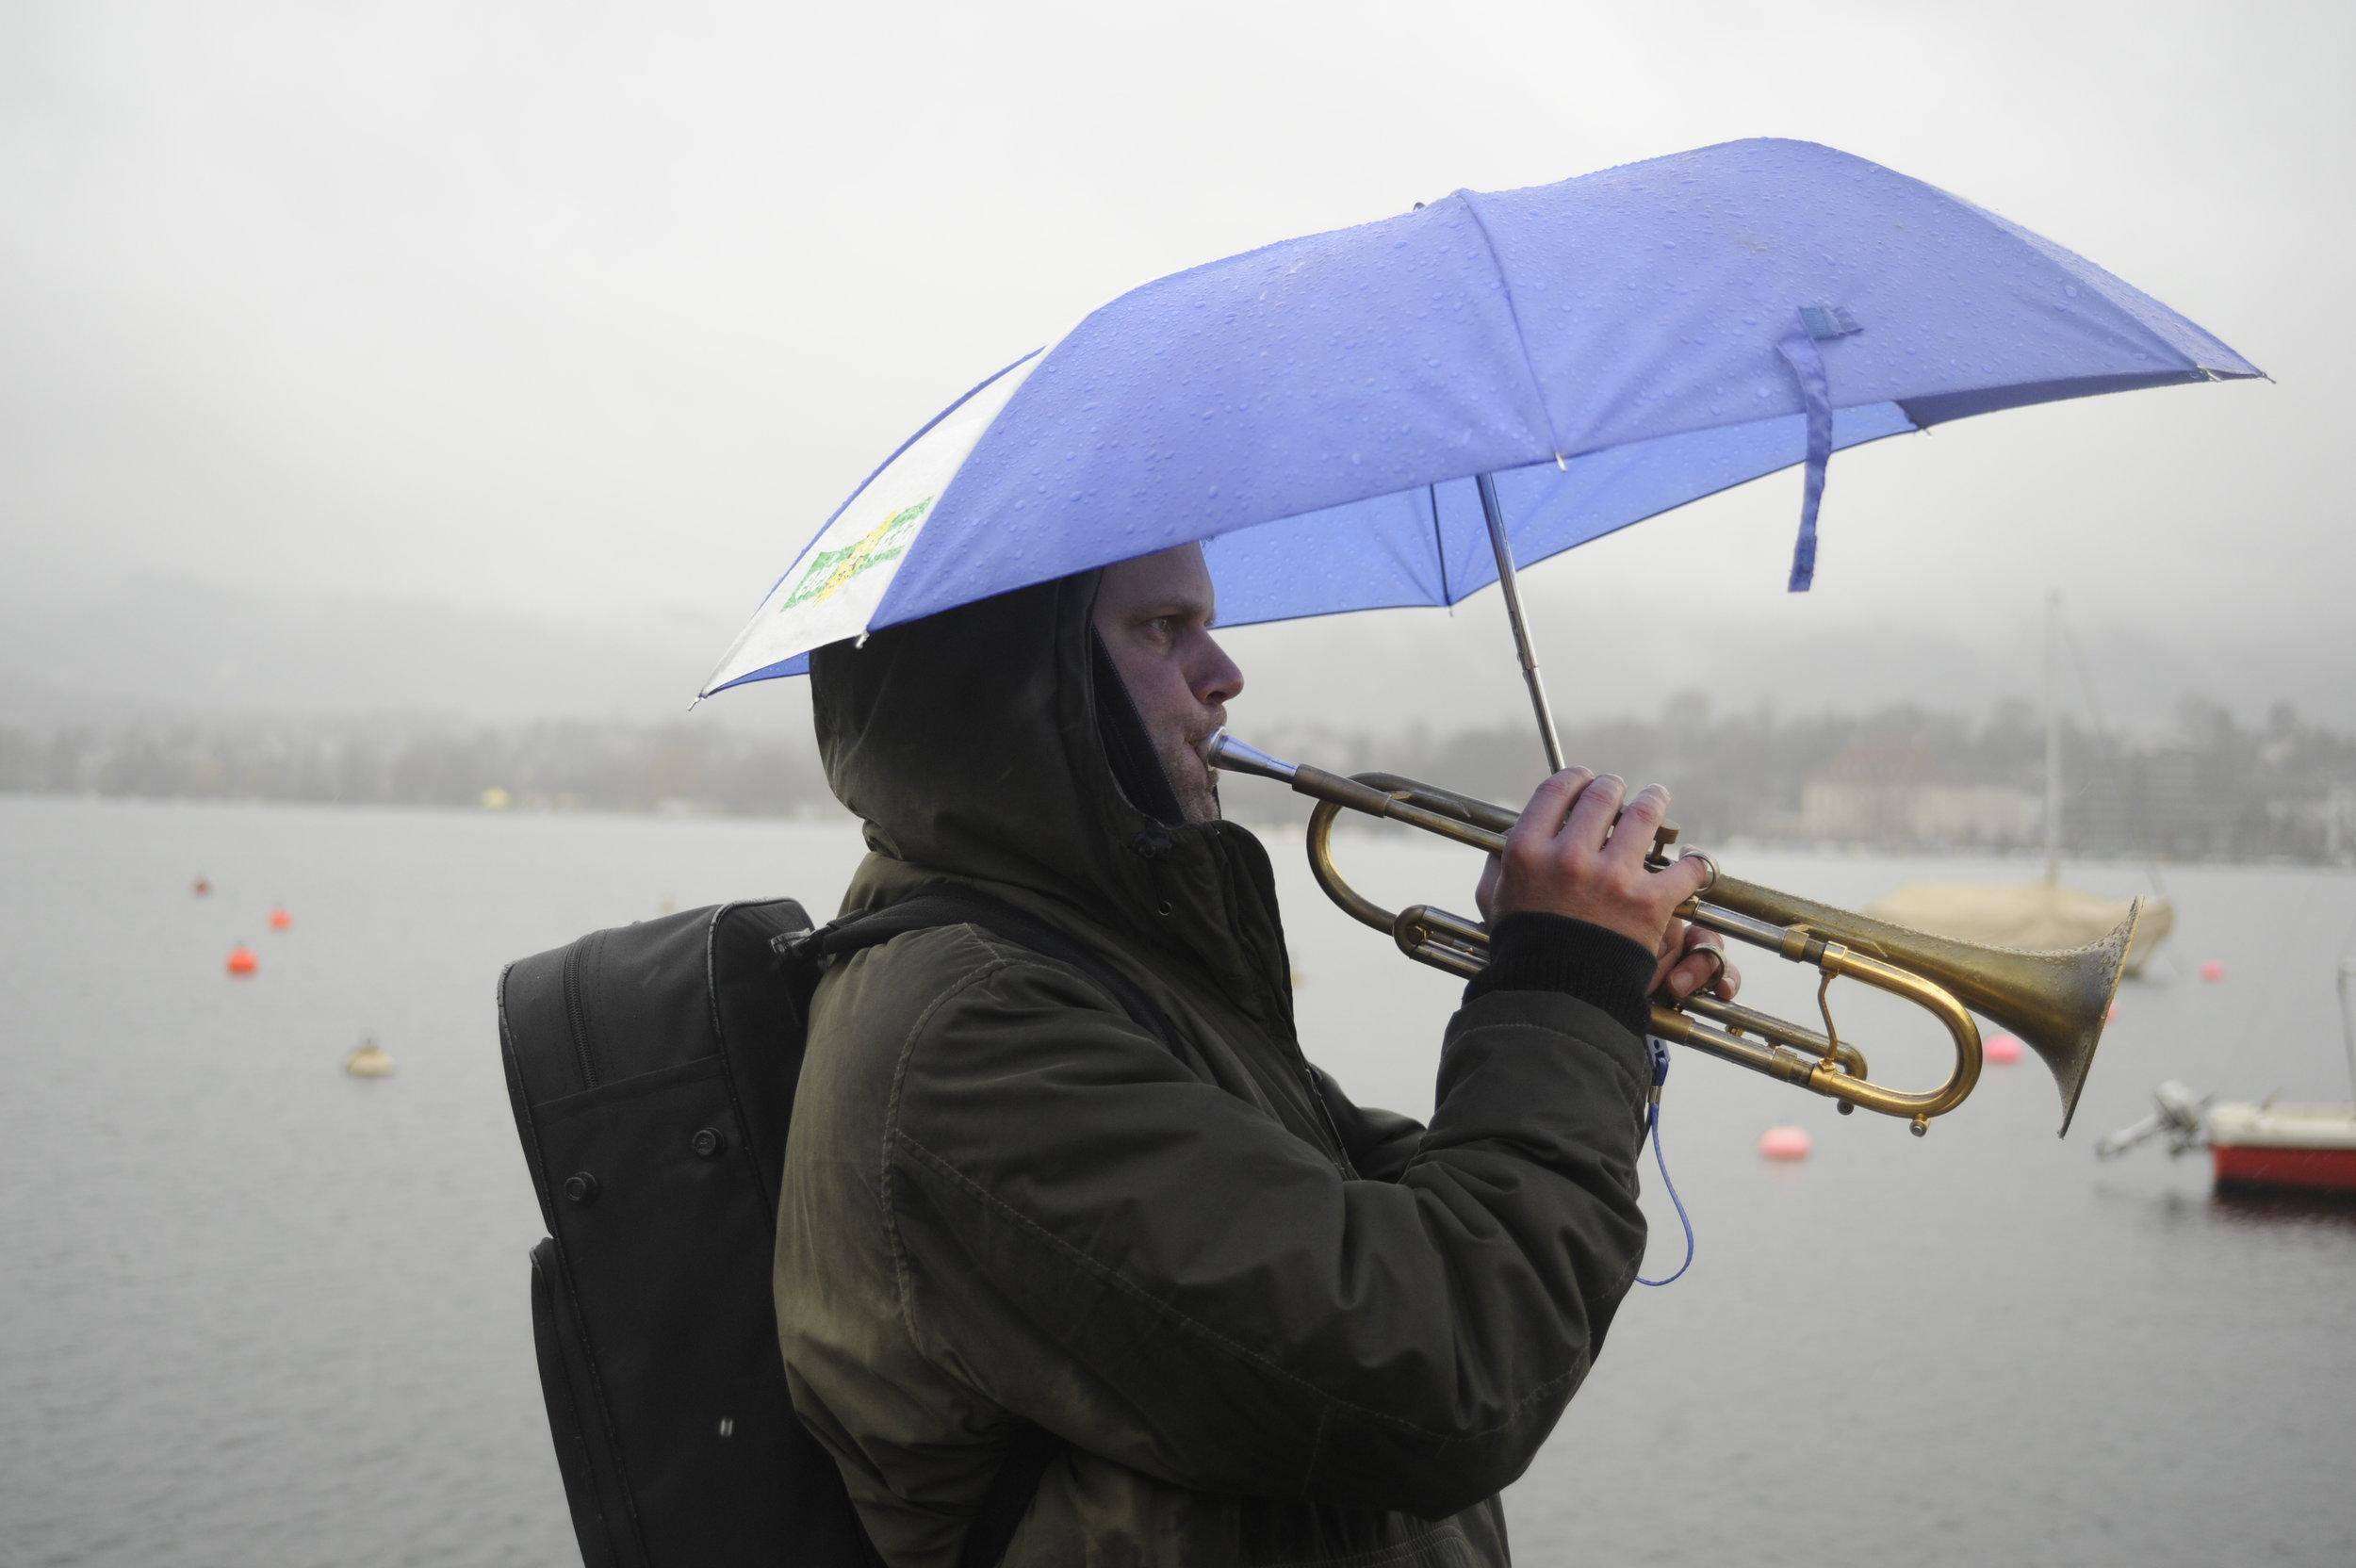 Umbrella and Trumpet